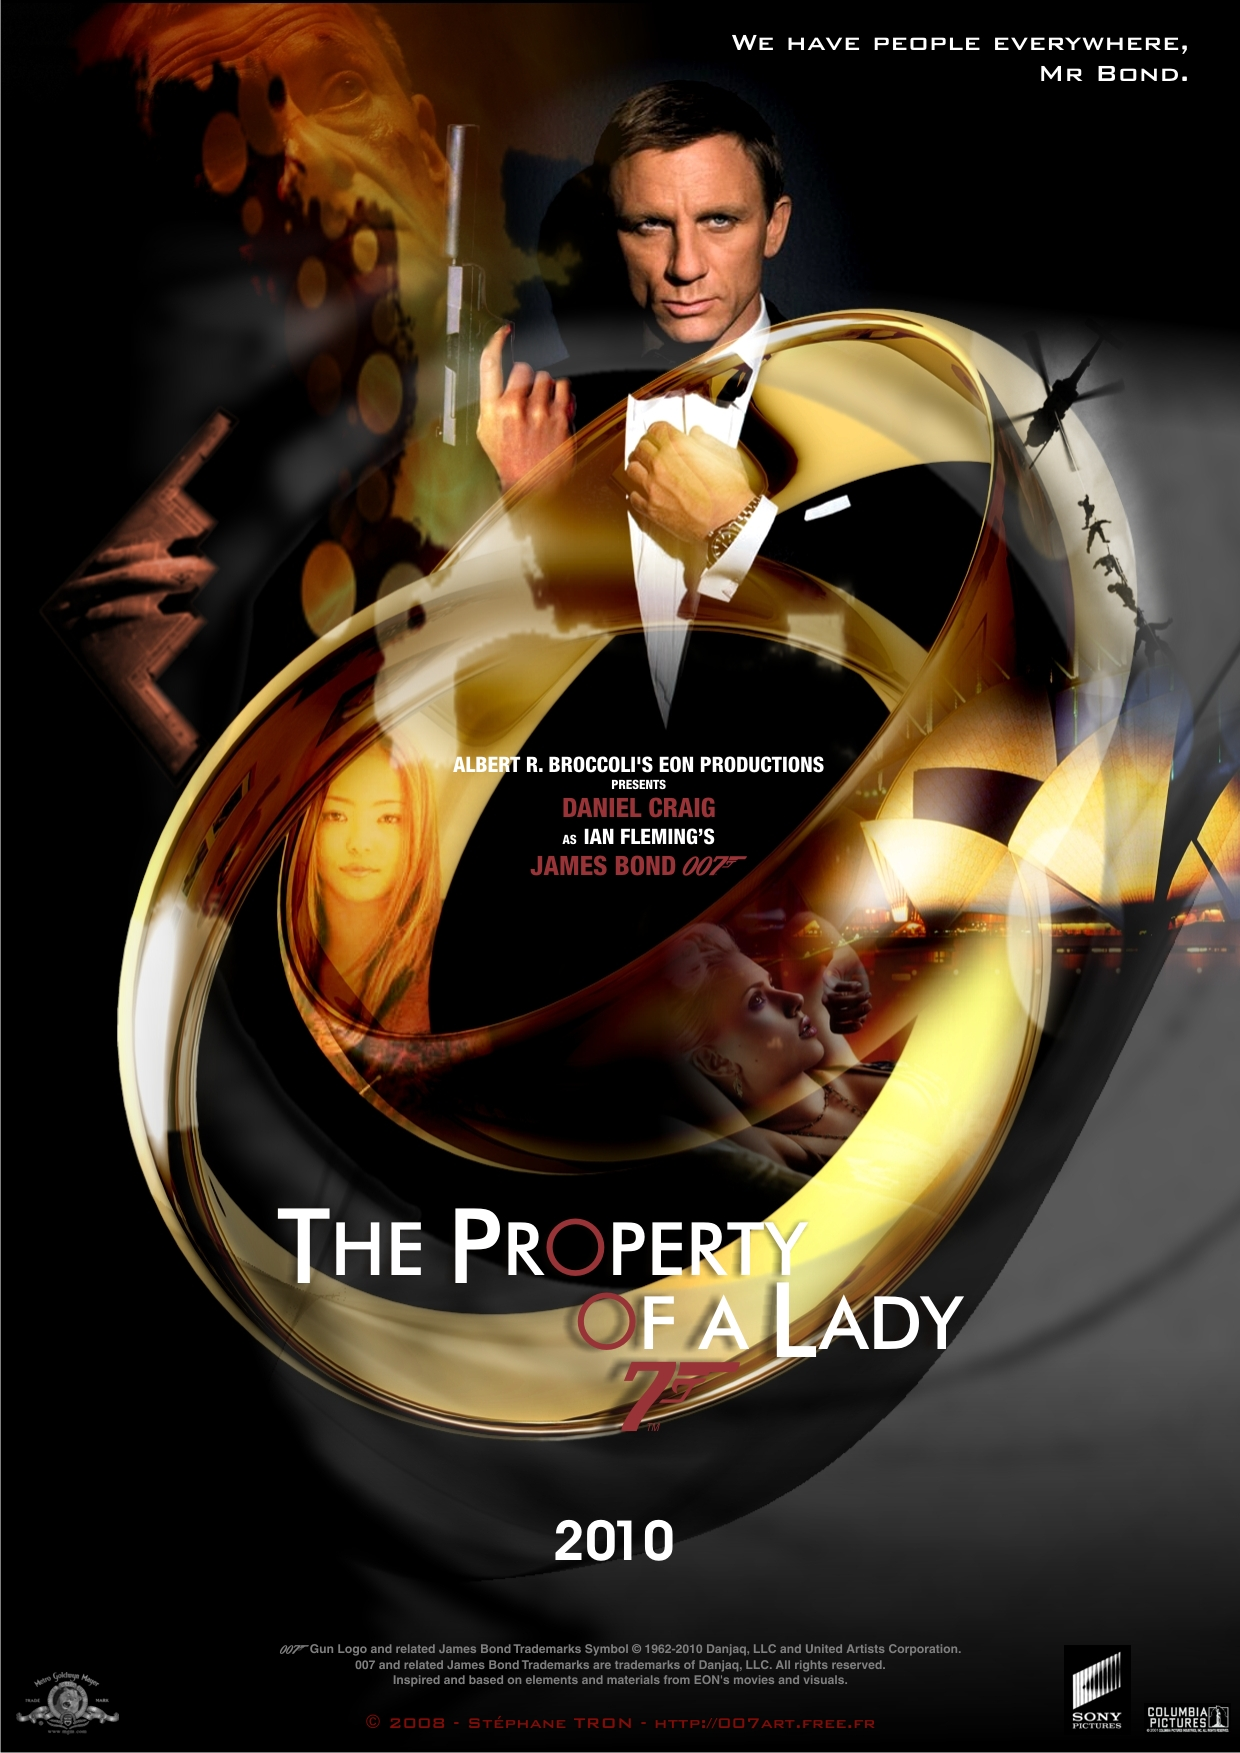 the next bond film